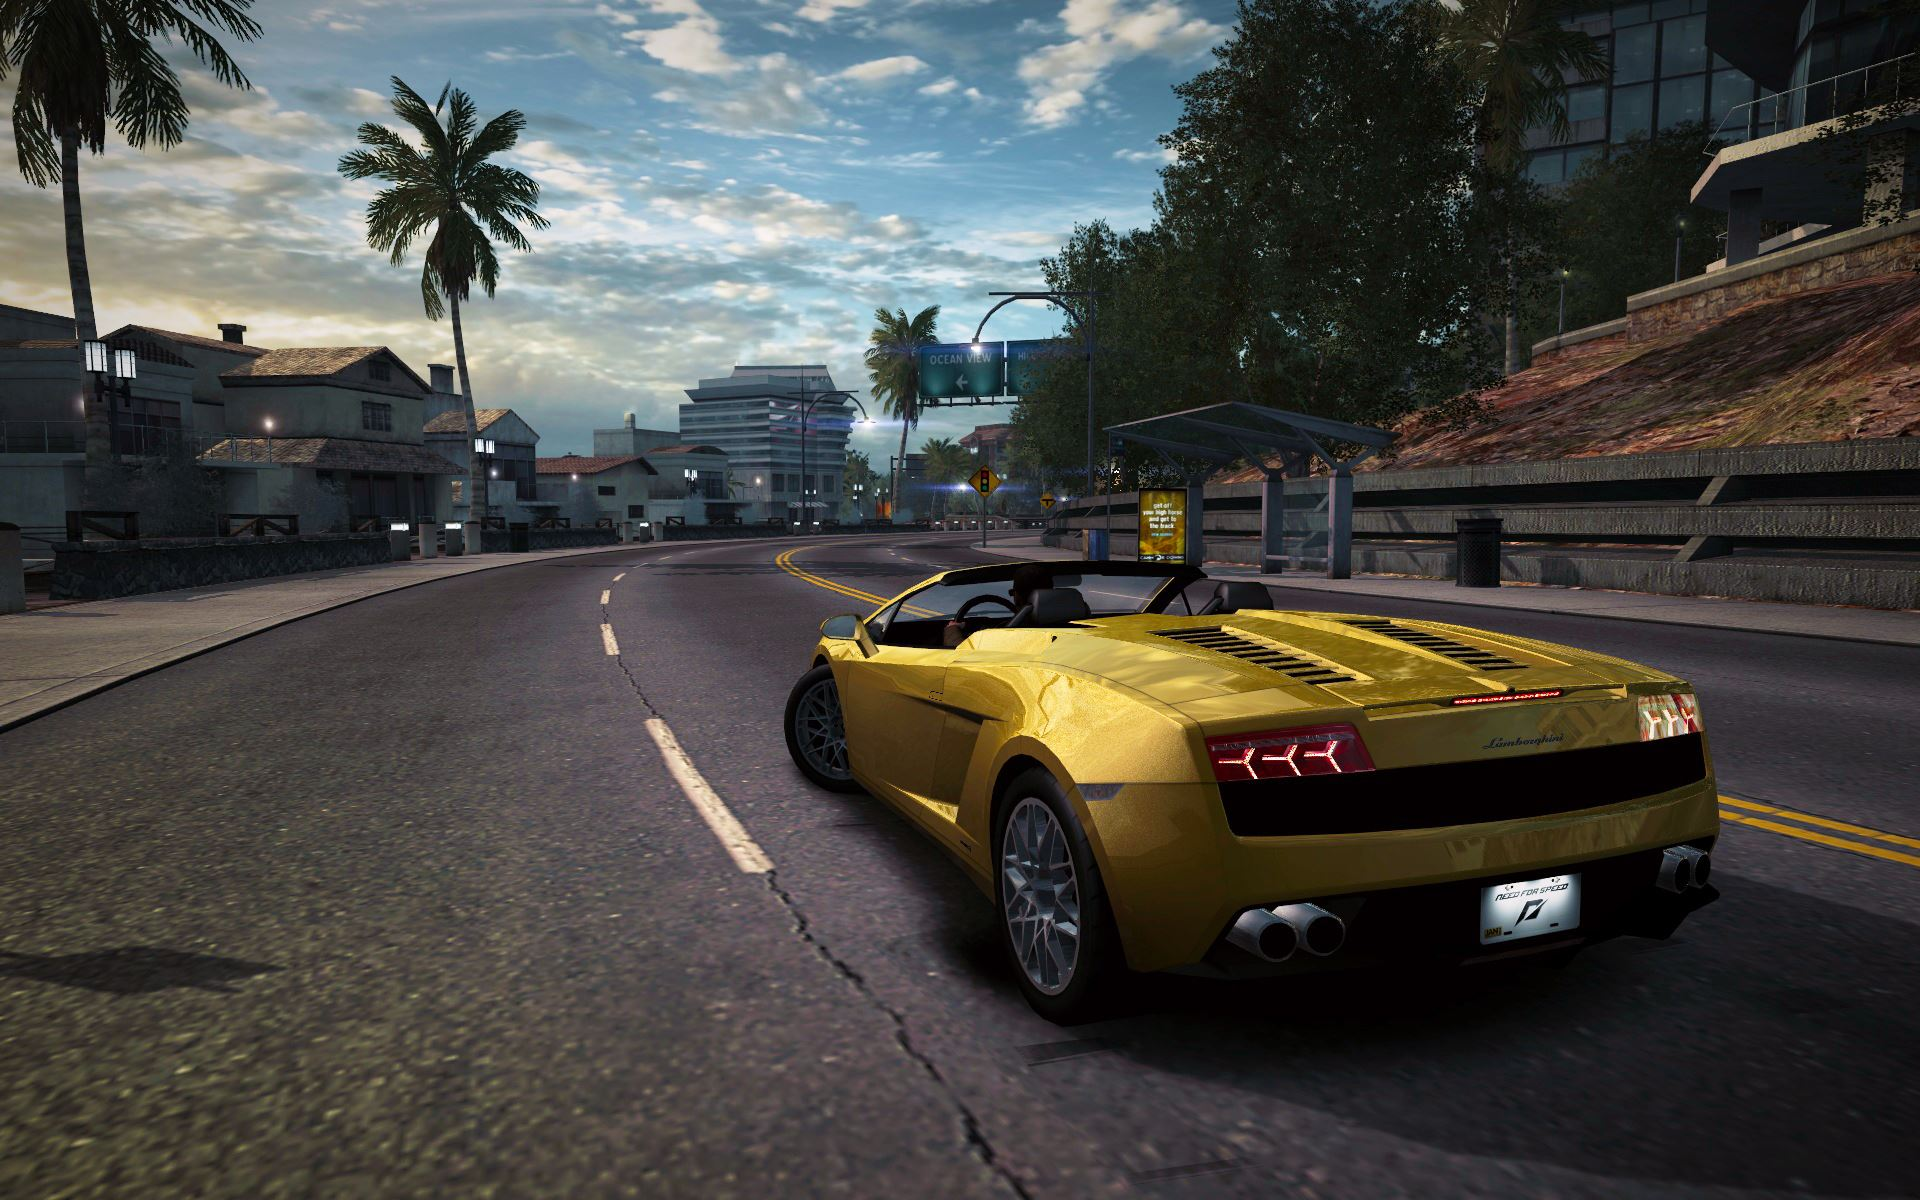 lamborghini gallardo lp560 4 spyder nfs world wiki fandom powered by wikia - Yellow Lamborghini Gallardo Spyder Wallpaper